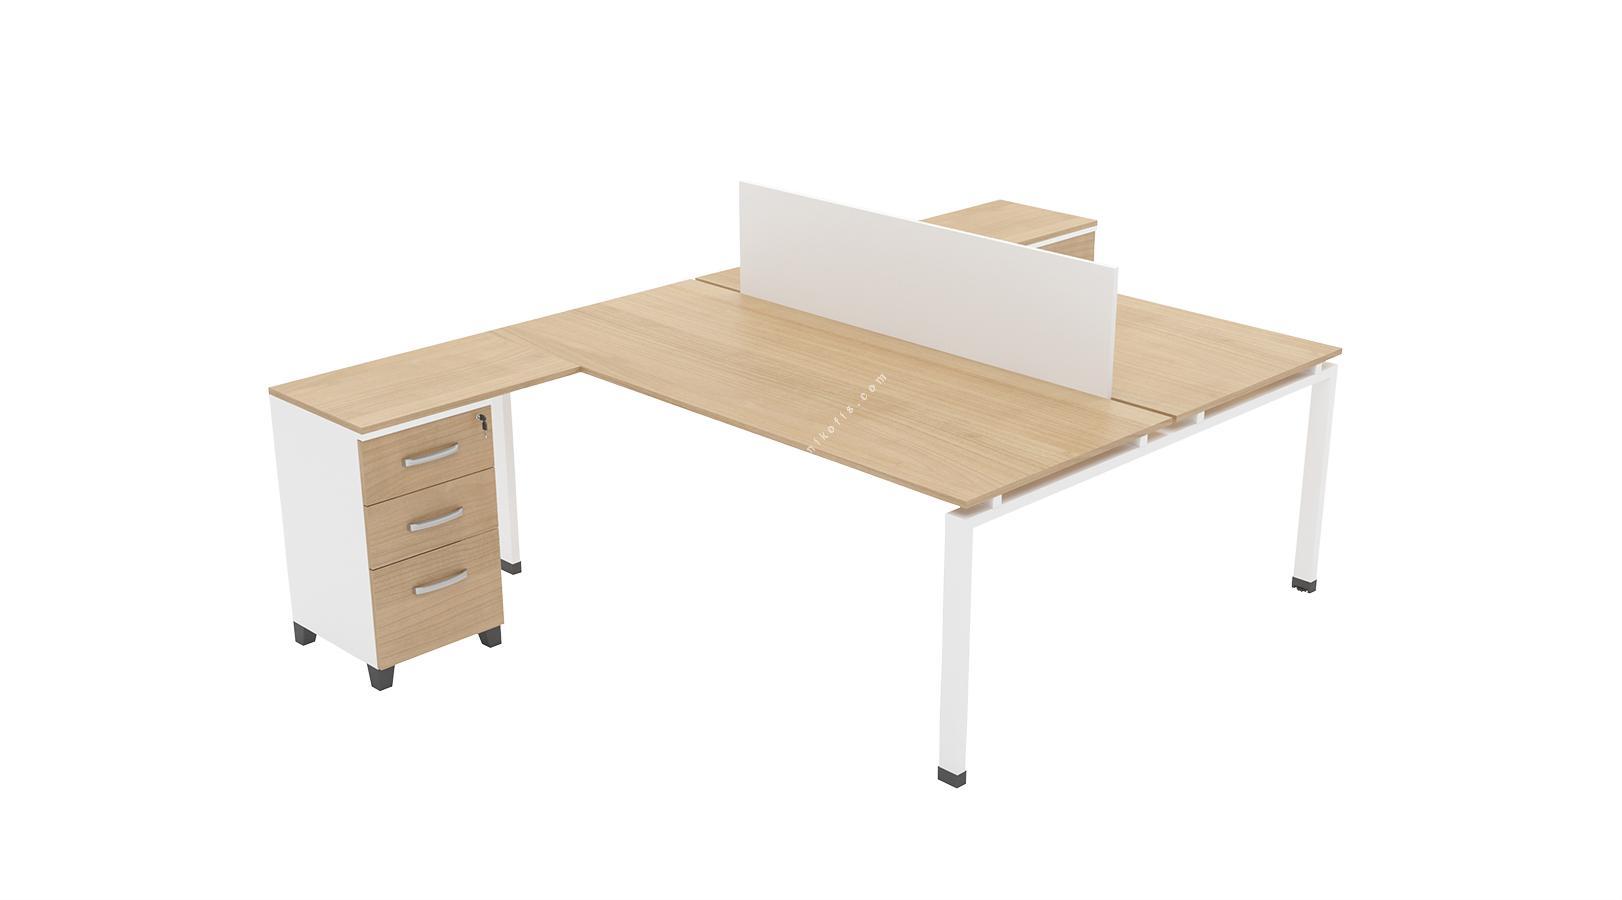 comentwork l masalı ikili workstation 140 cm